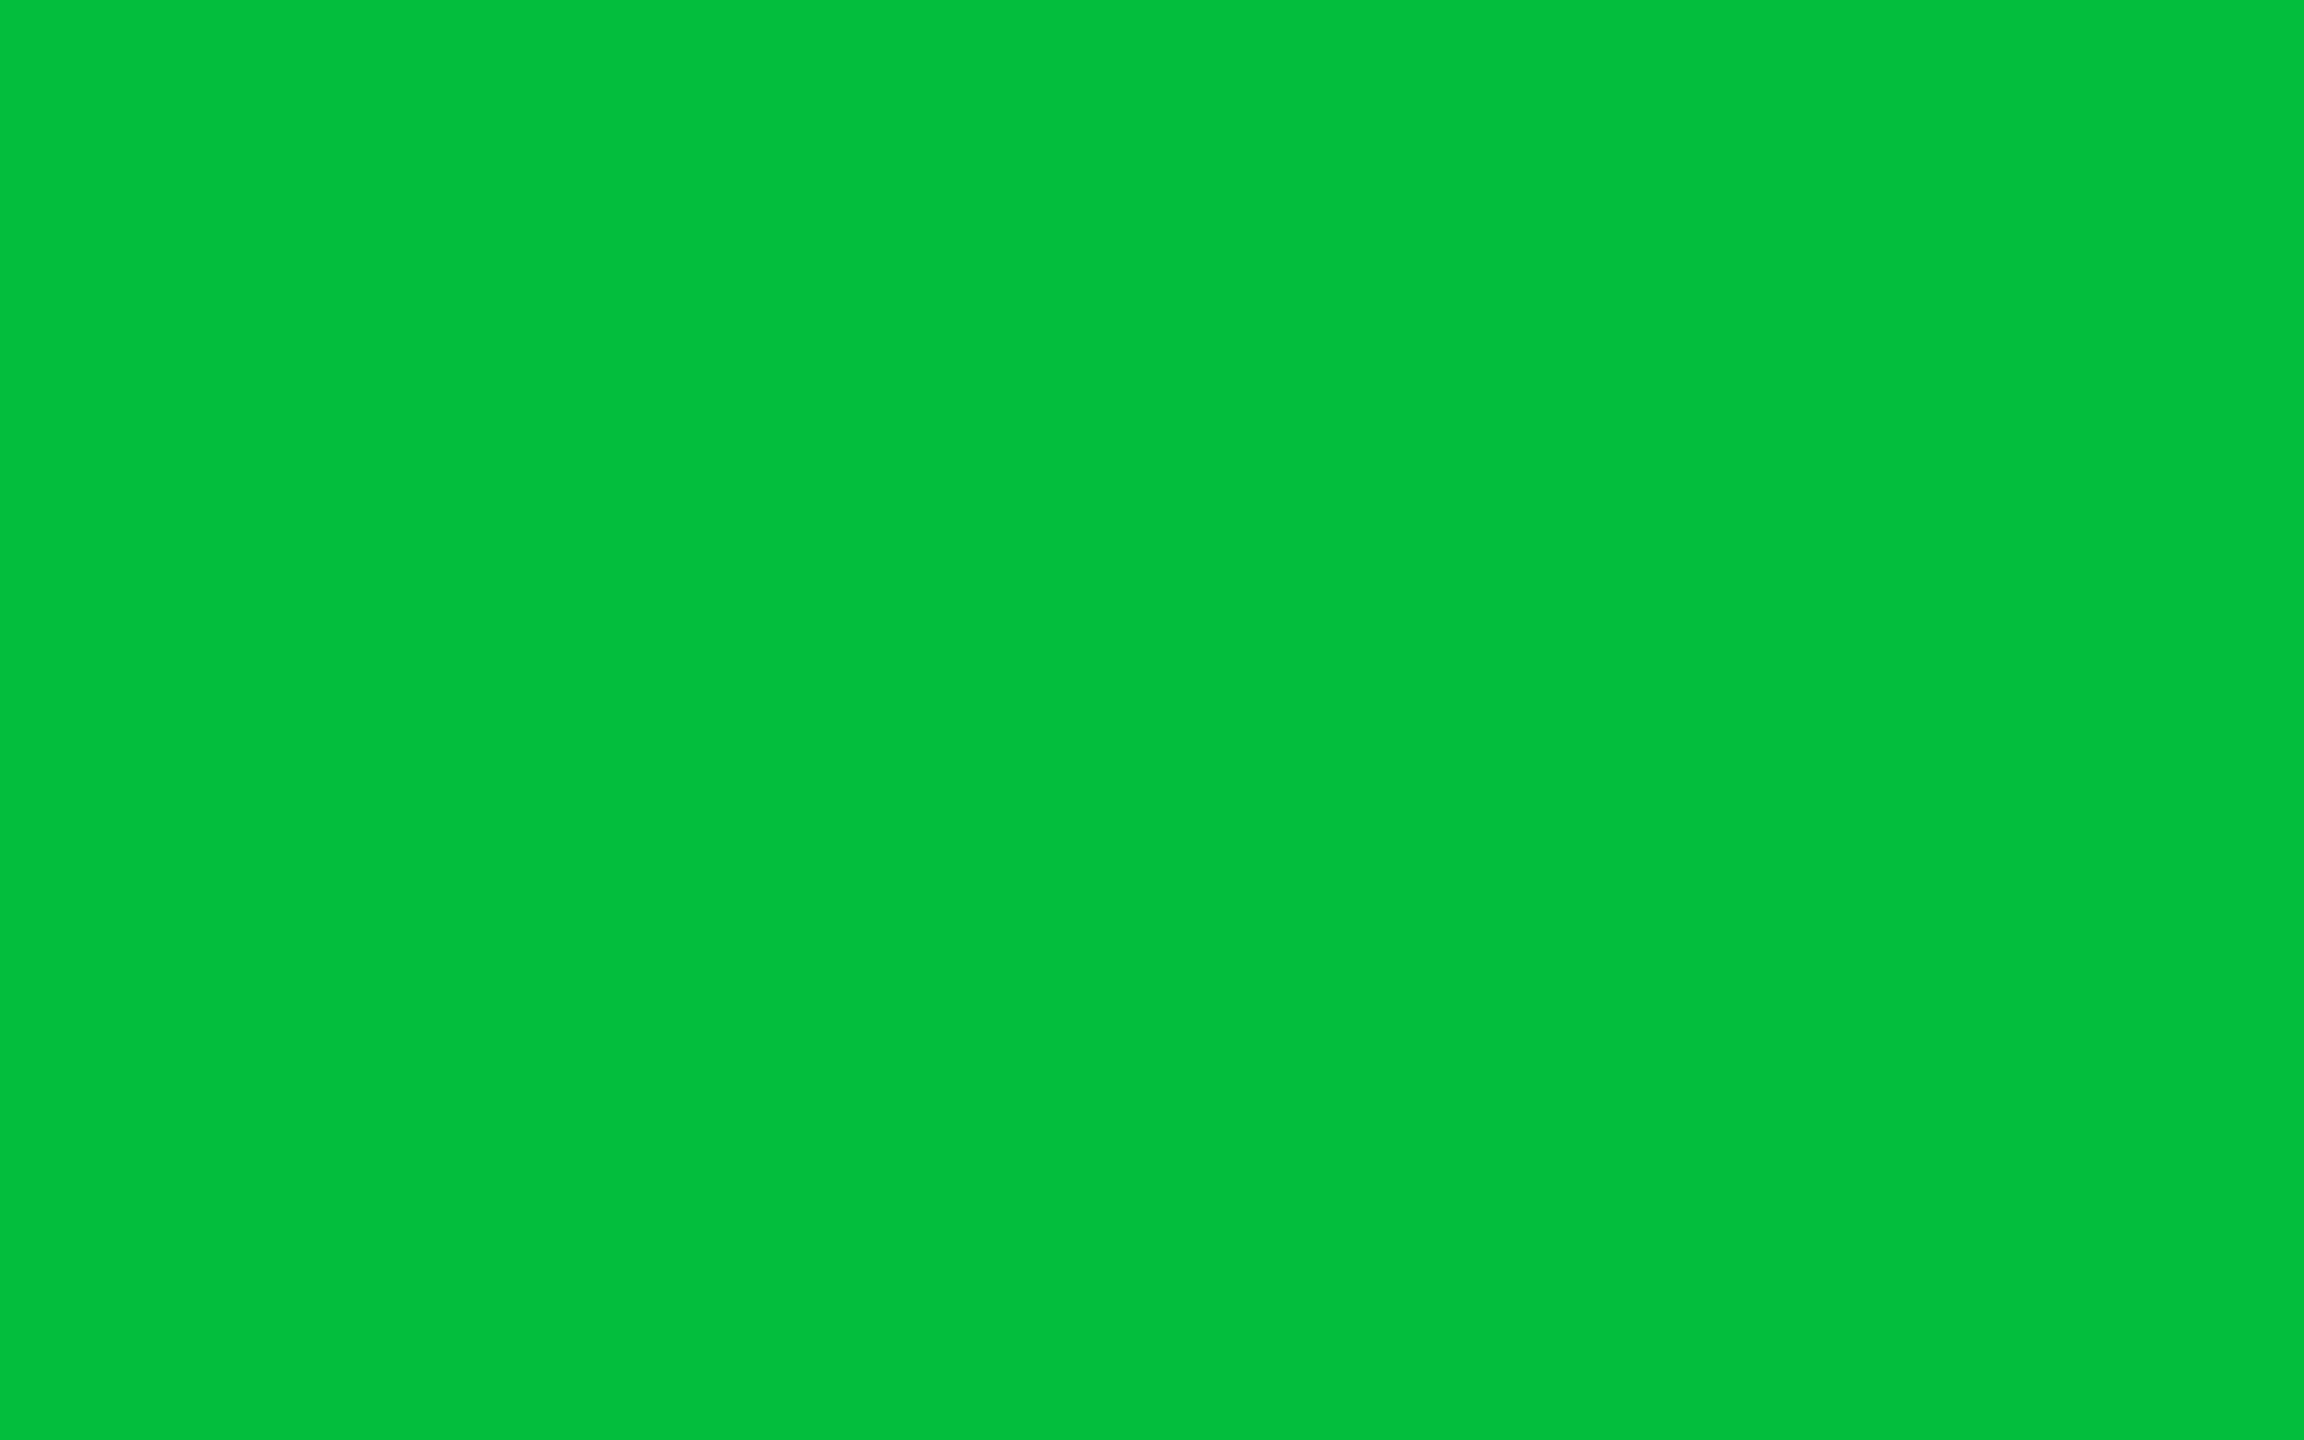 2304x1440 Dark Pastel Green Solid Color Background